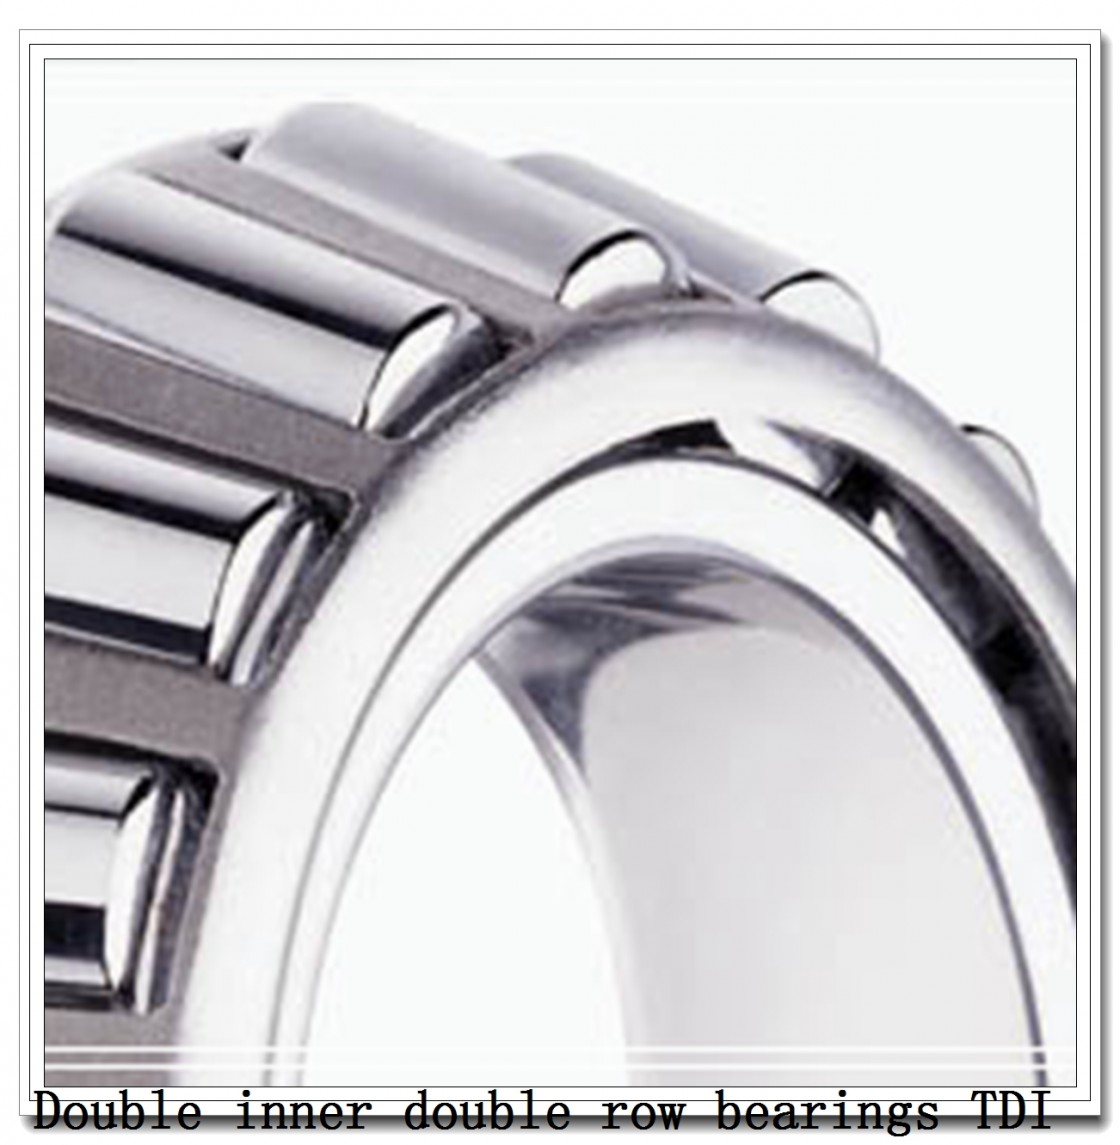 280TDO470-1 Double inner double row bearings TDI